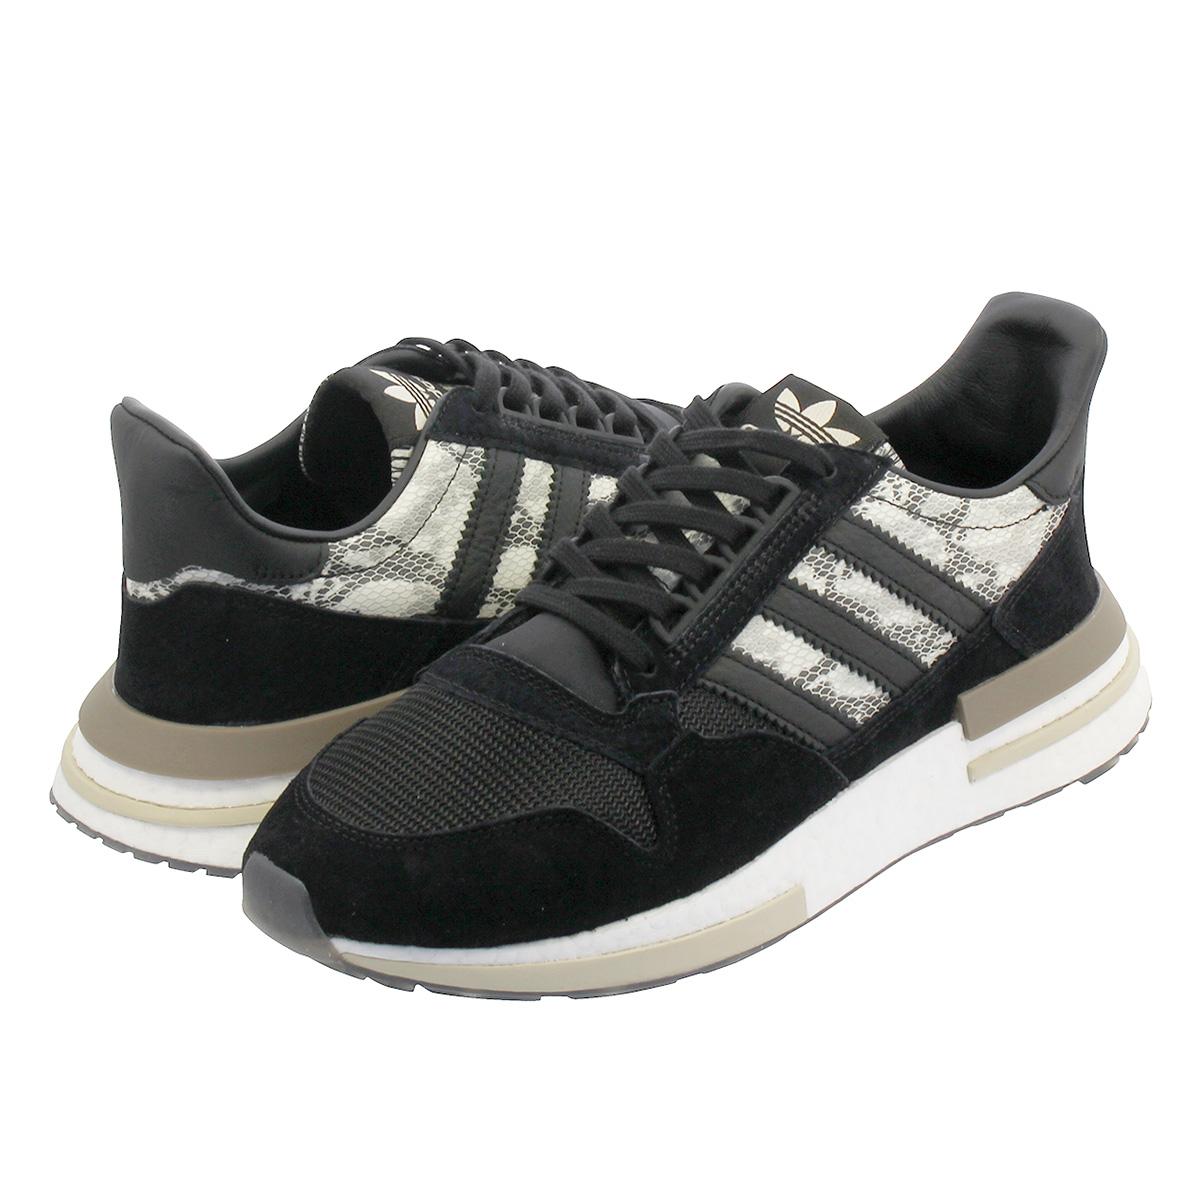 7a30114d3e054 adidas ZX 500 RM Adidas ZX 500 RM CORE BLACK CORE BLACK RUNNING WHITE bd7924